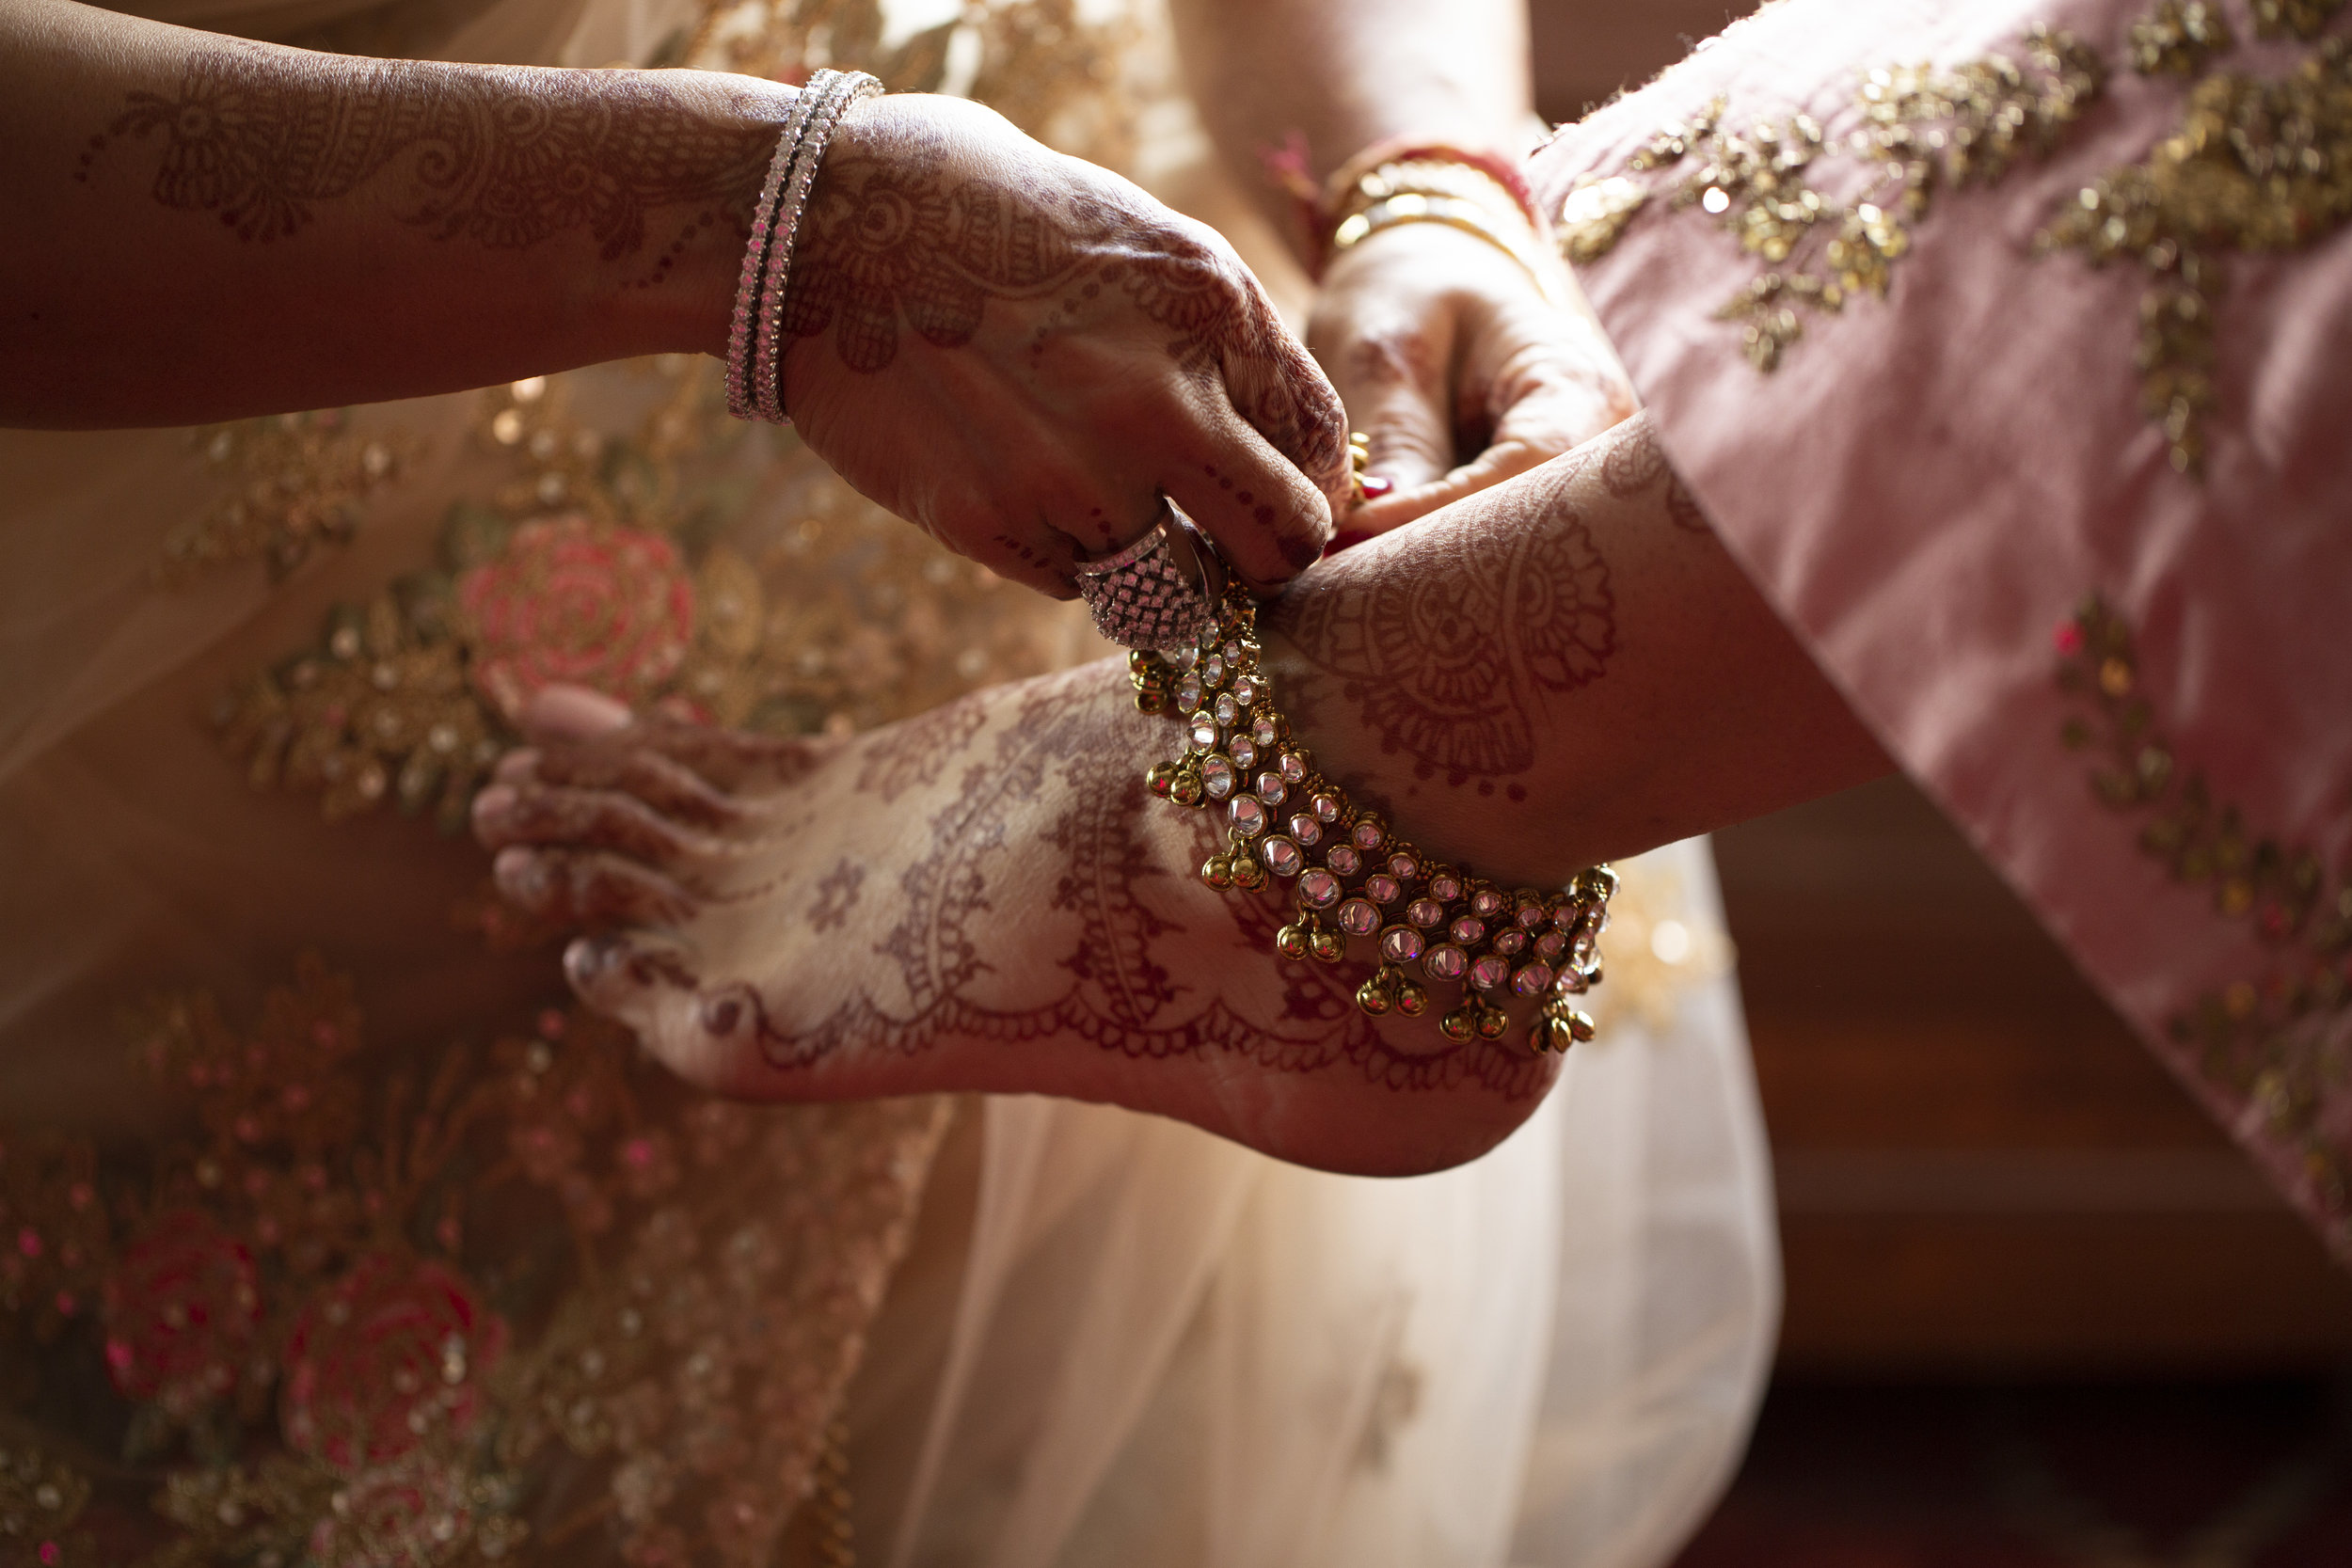 INDIAN WEDDING BRIDE FOOT HENNA.JPG